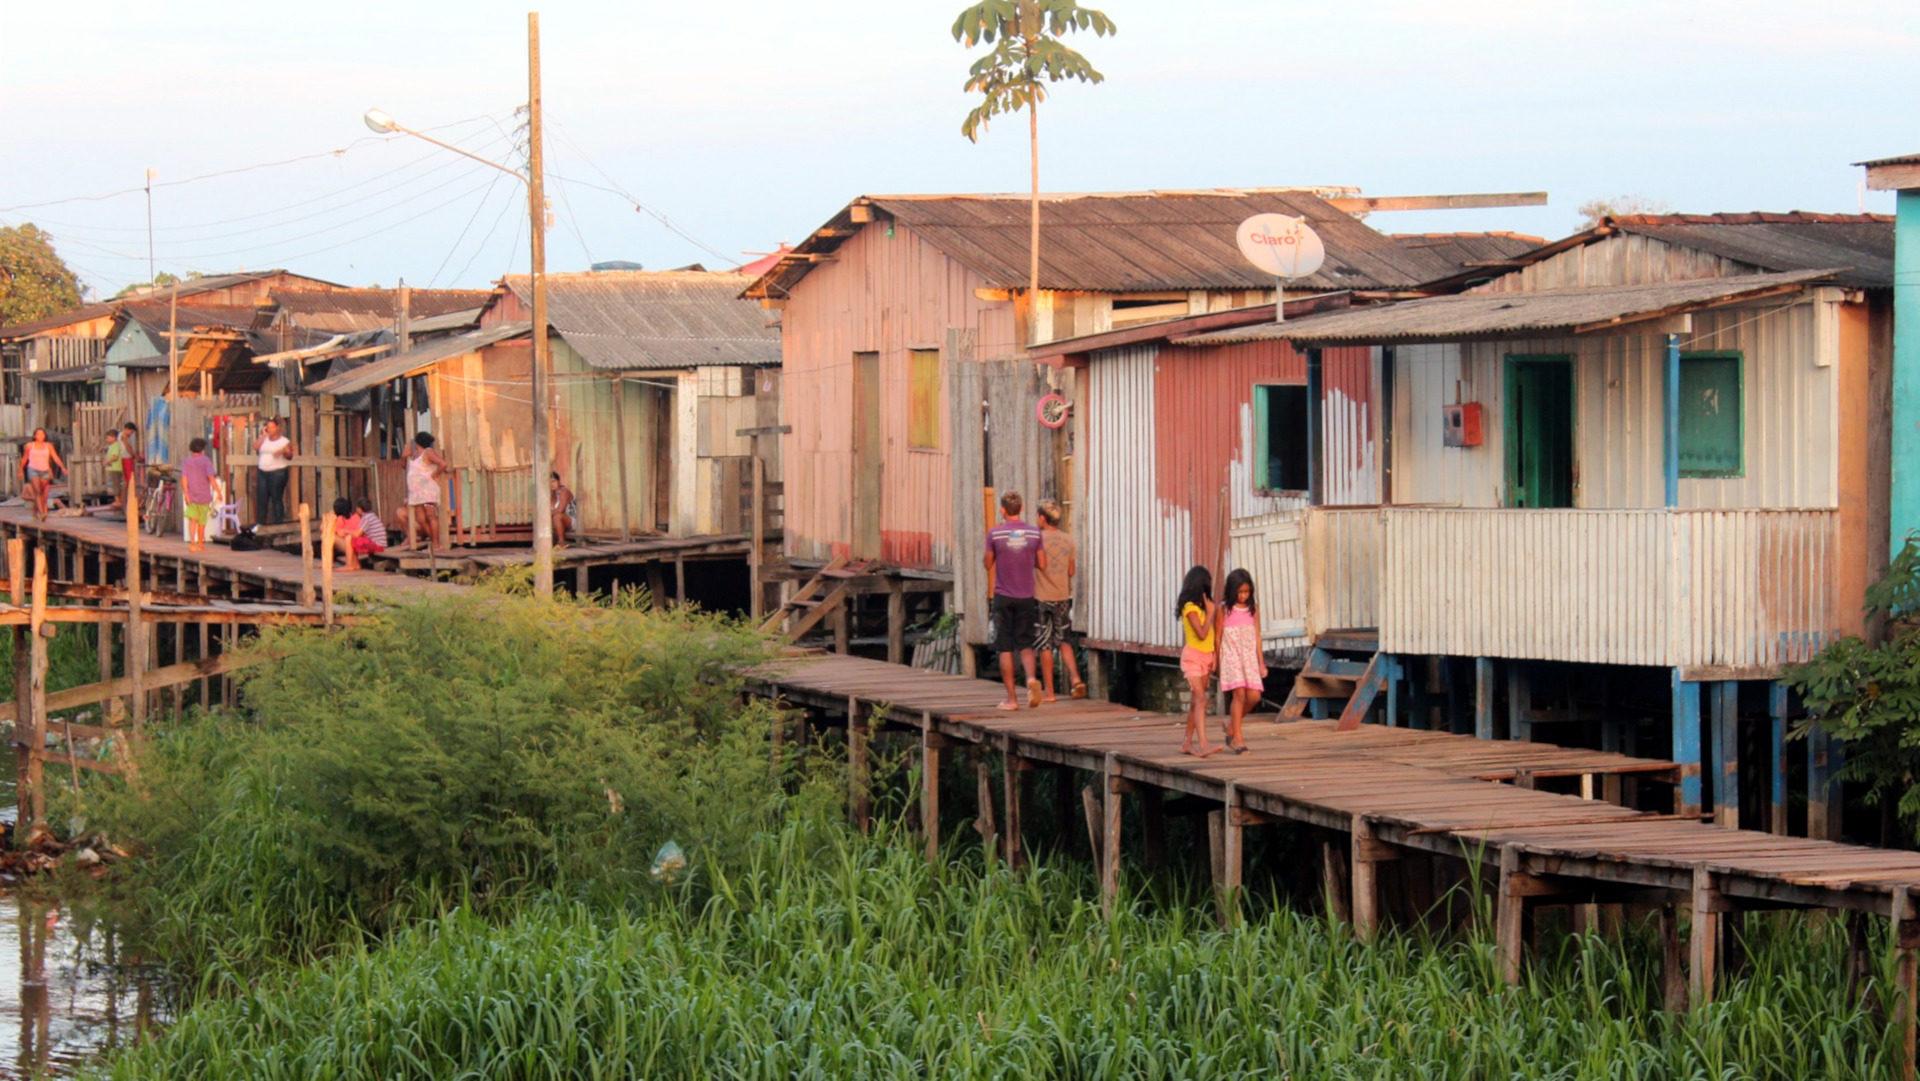 Armenviertel am Amazonas | ©pixabay/Anfri, Pixabay License